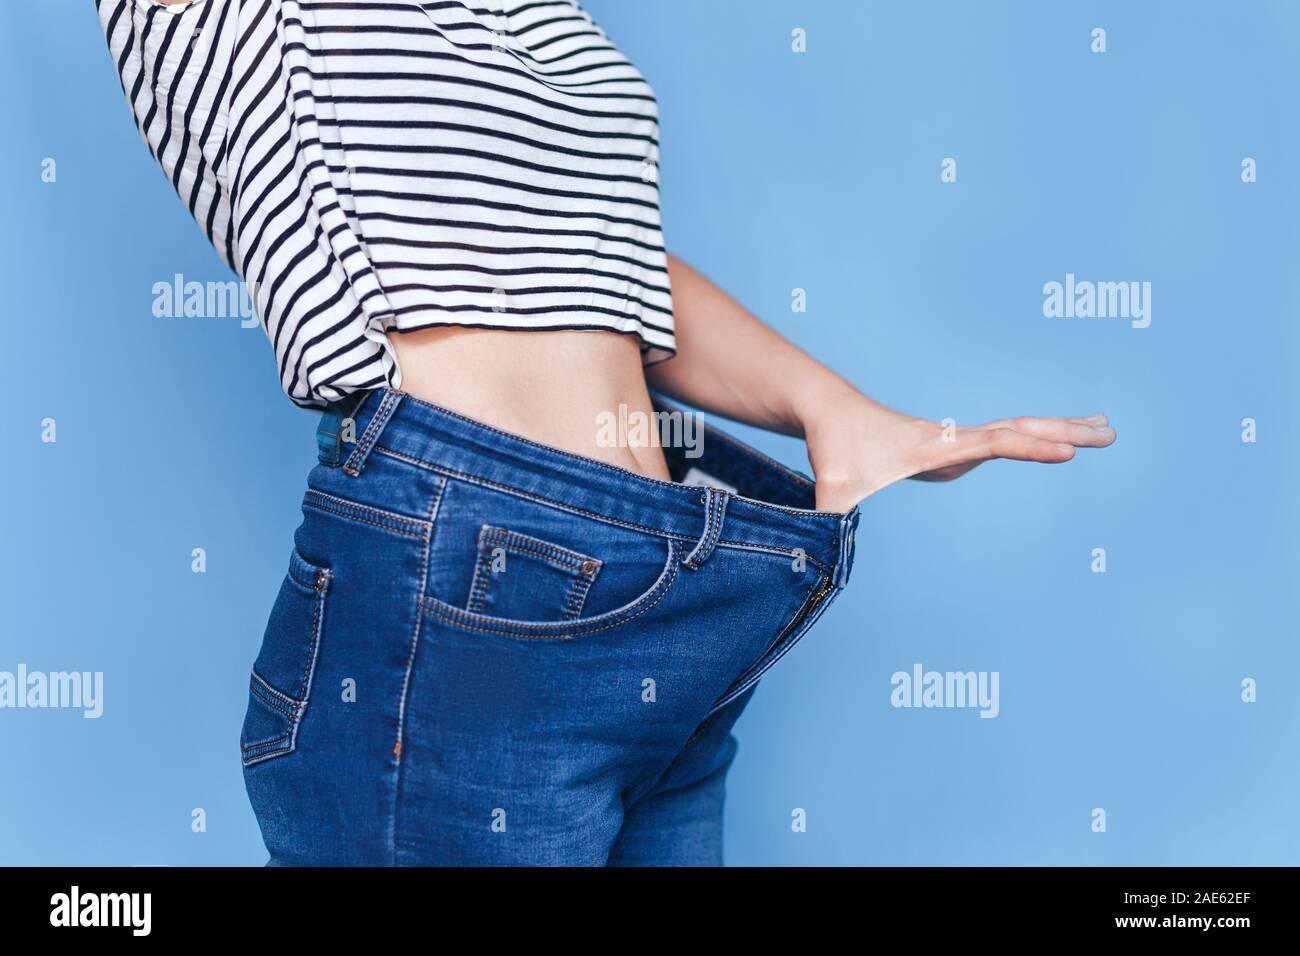 Cuerpo De Mujer Skinny Jeans Pantalones Flojos Fotografia De Stock Alamy